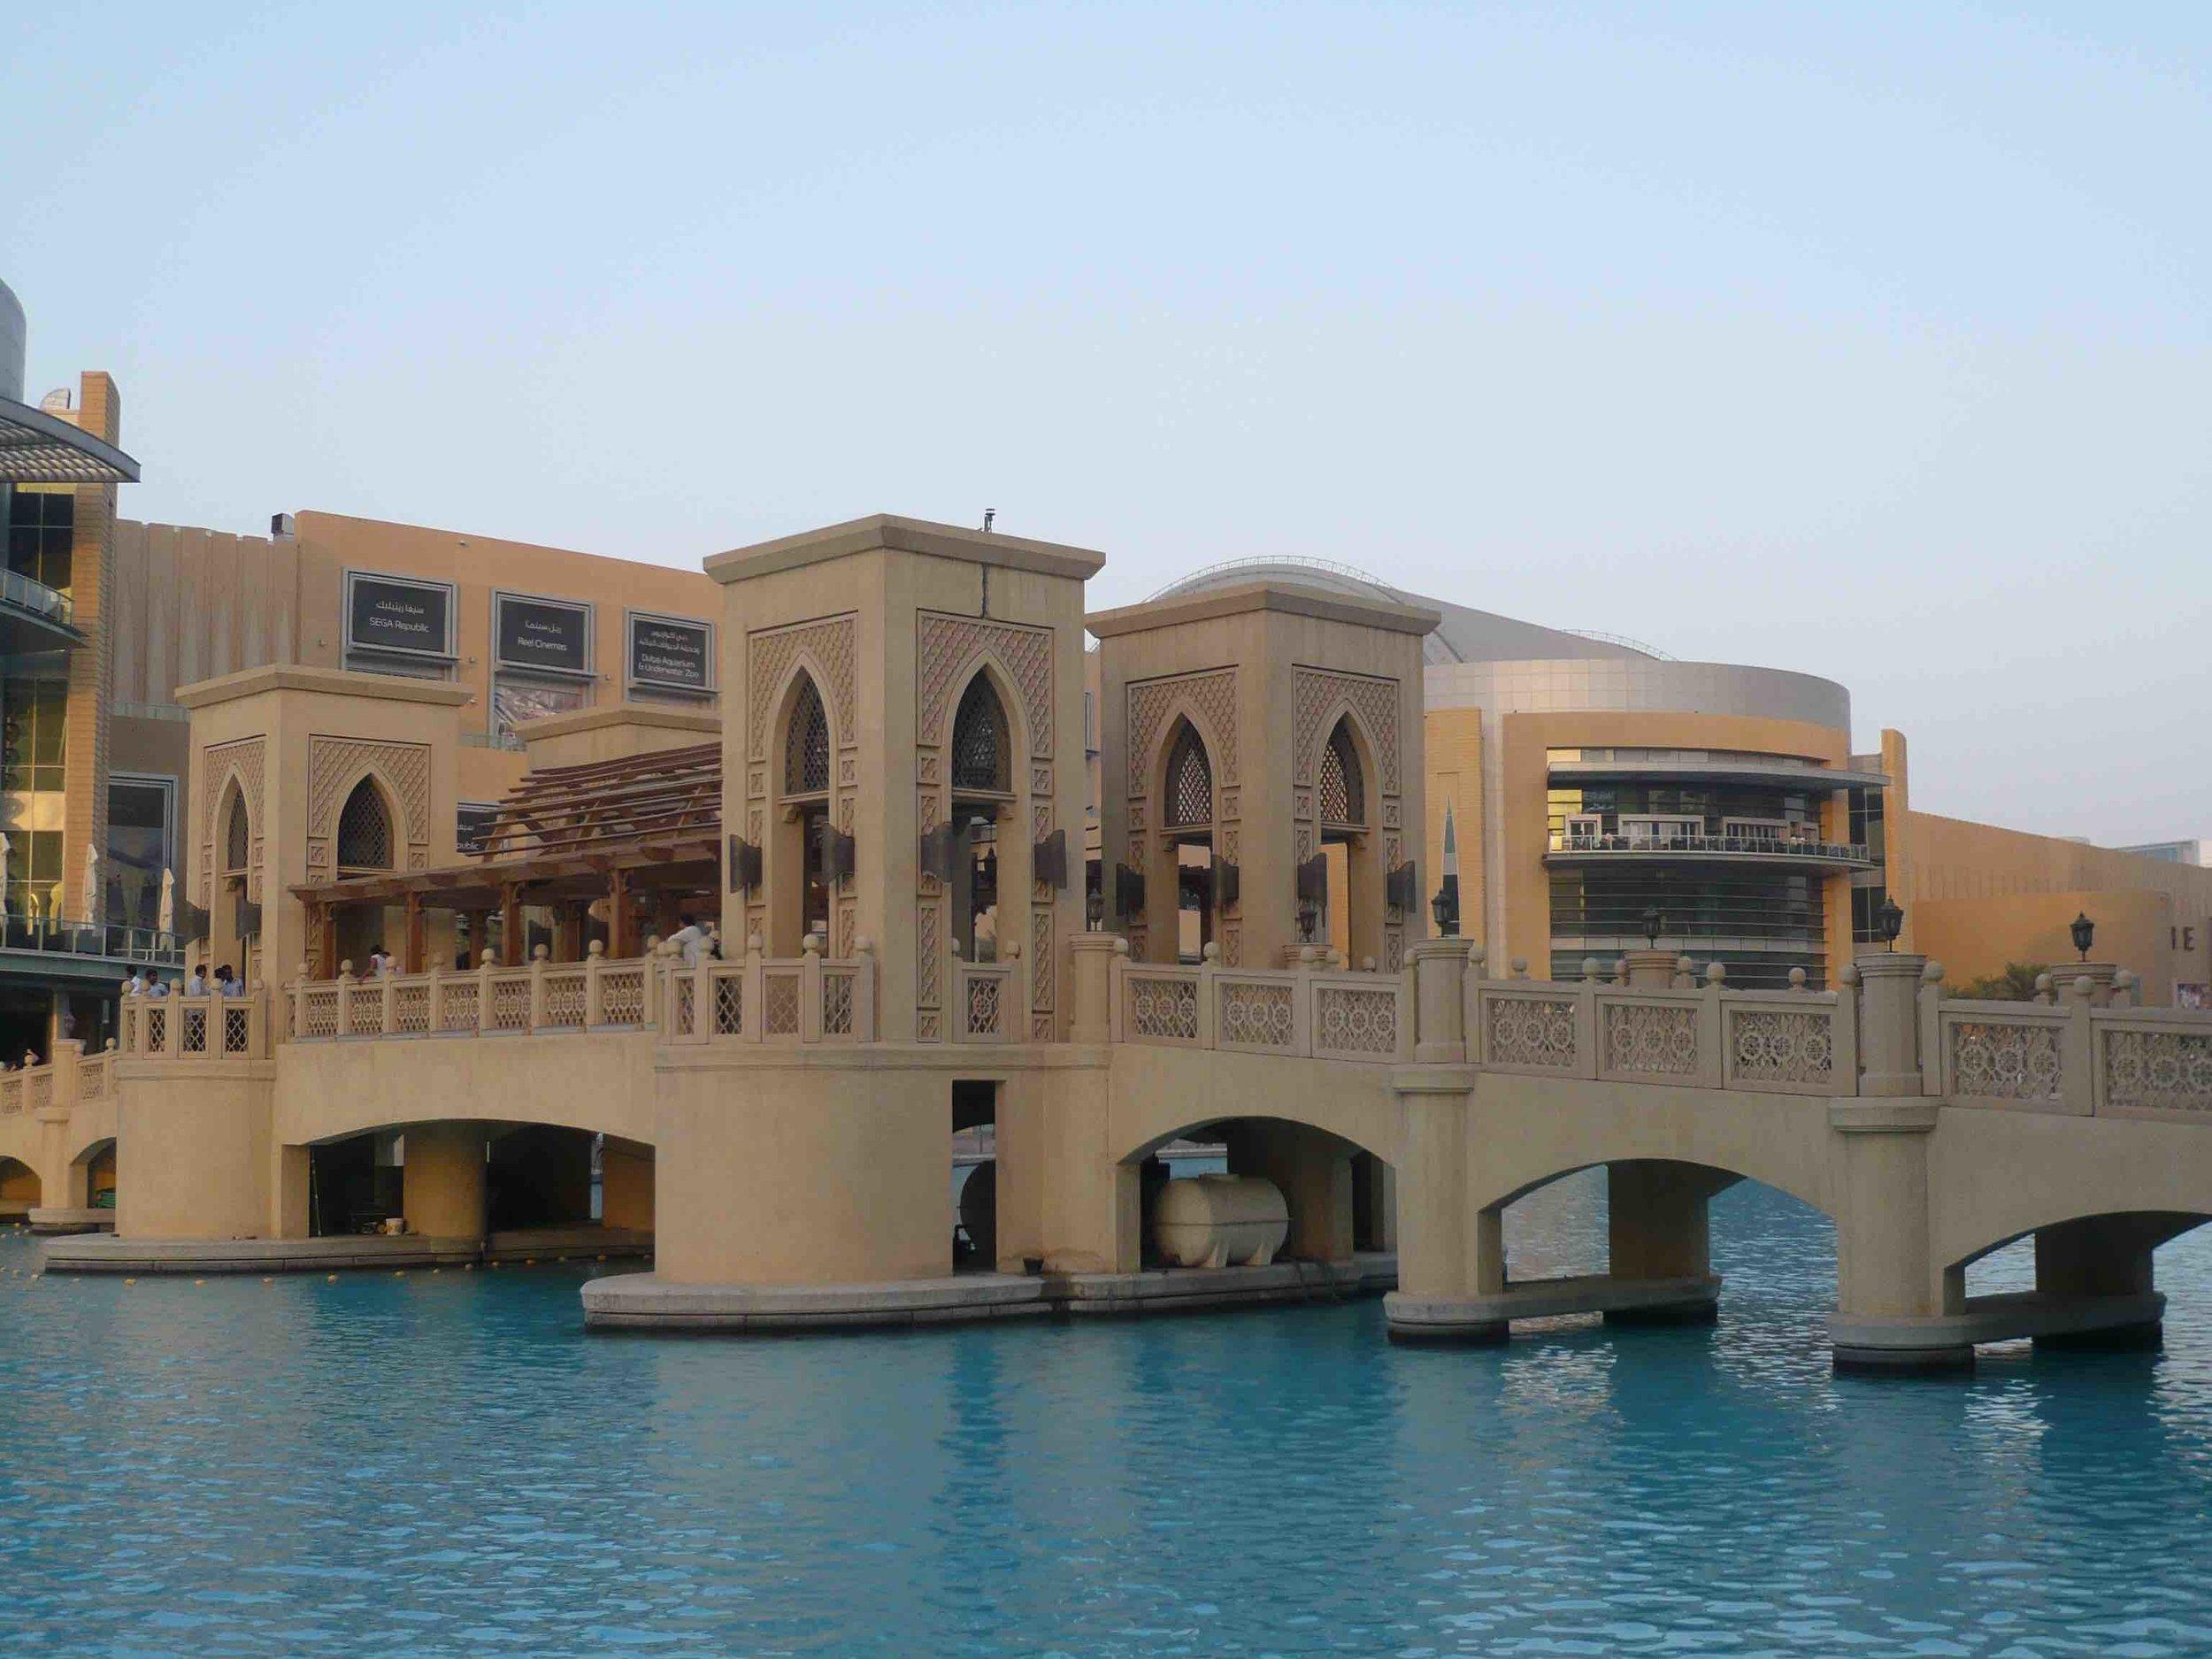 33 - 2010 - Dubai, France villa